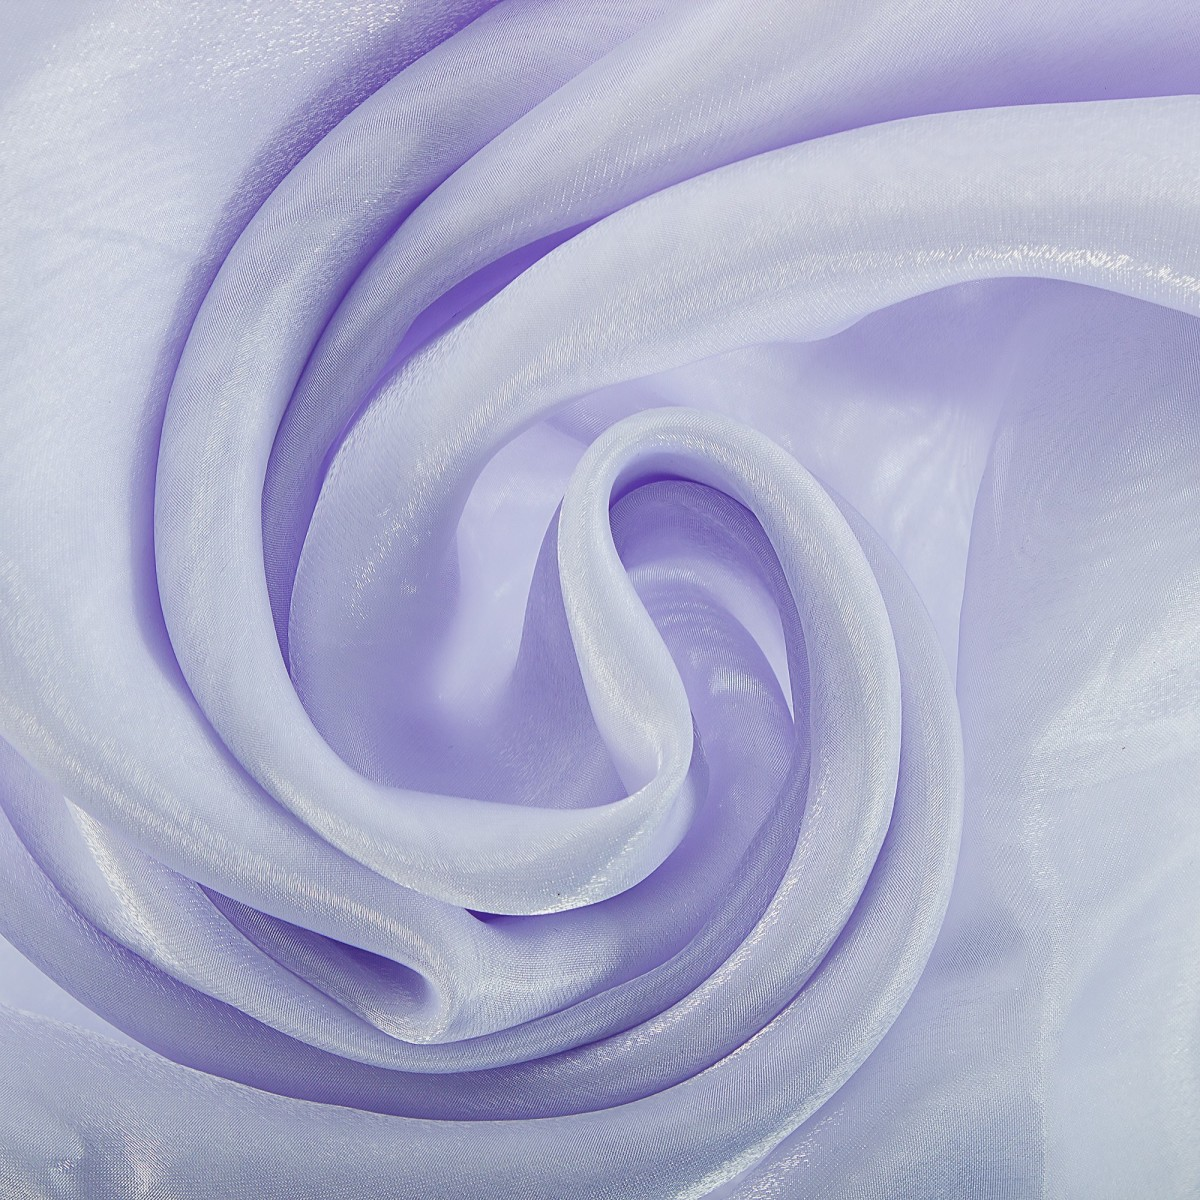 Тюль 1 п/м 280 см органза/сатин цвет белый